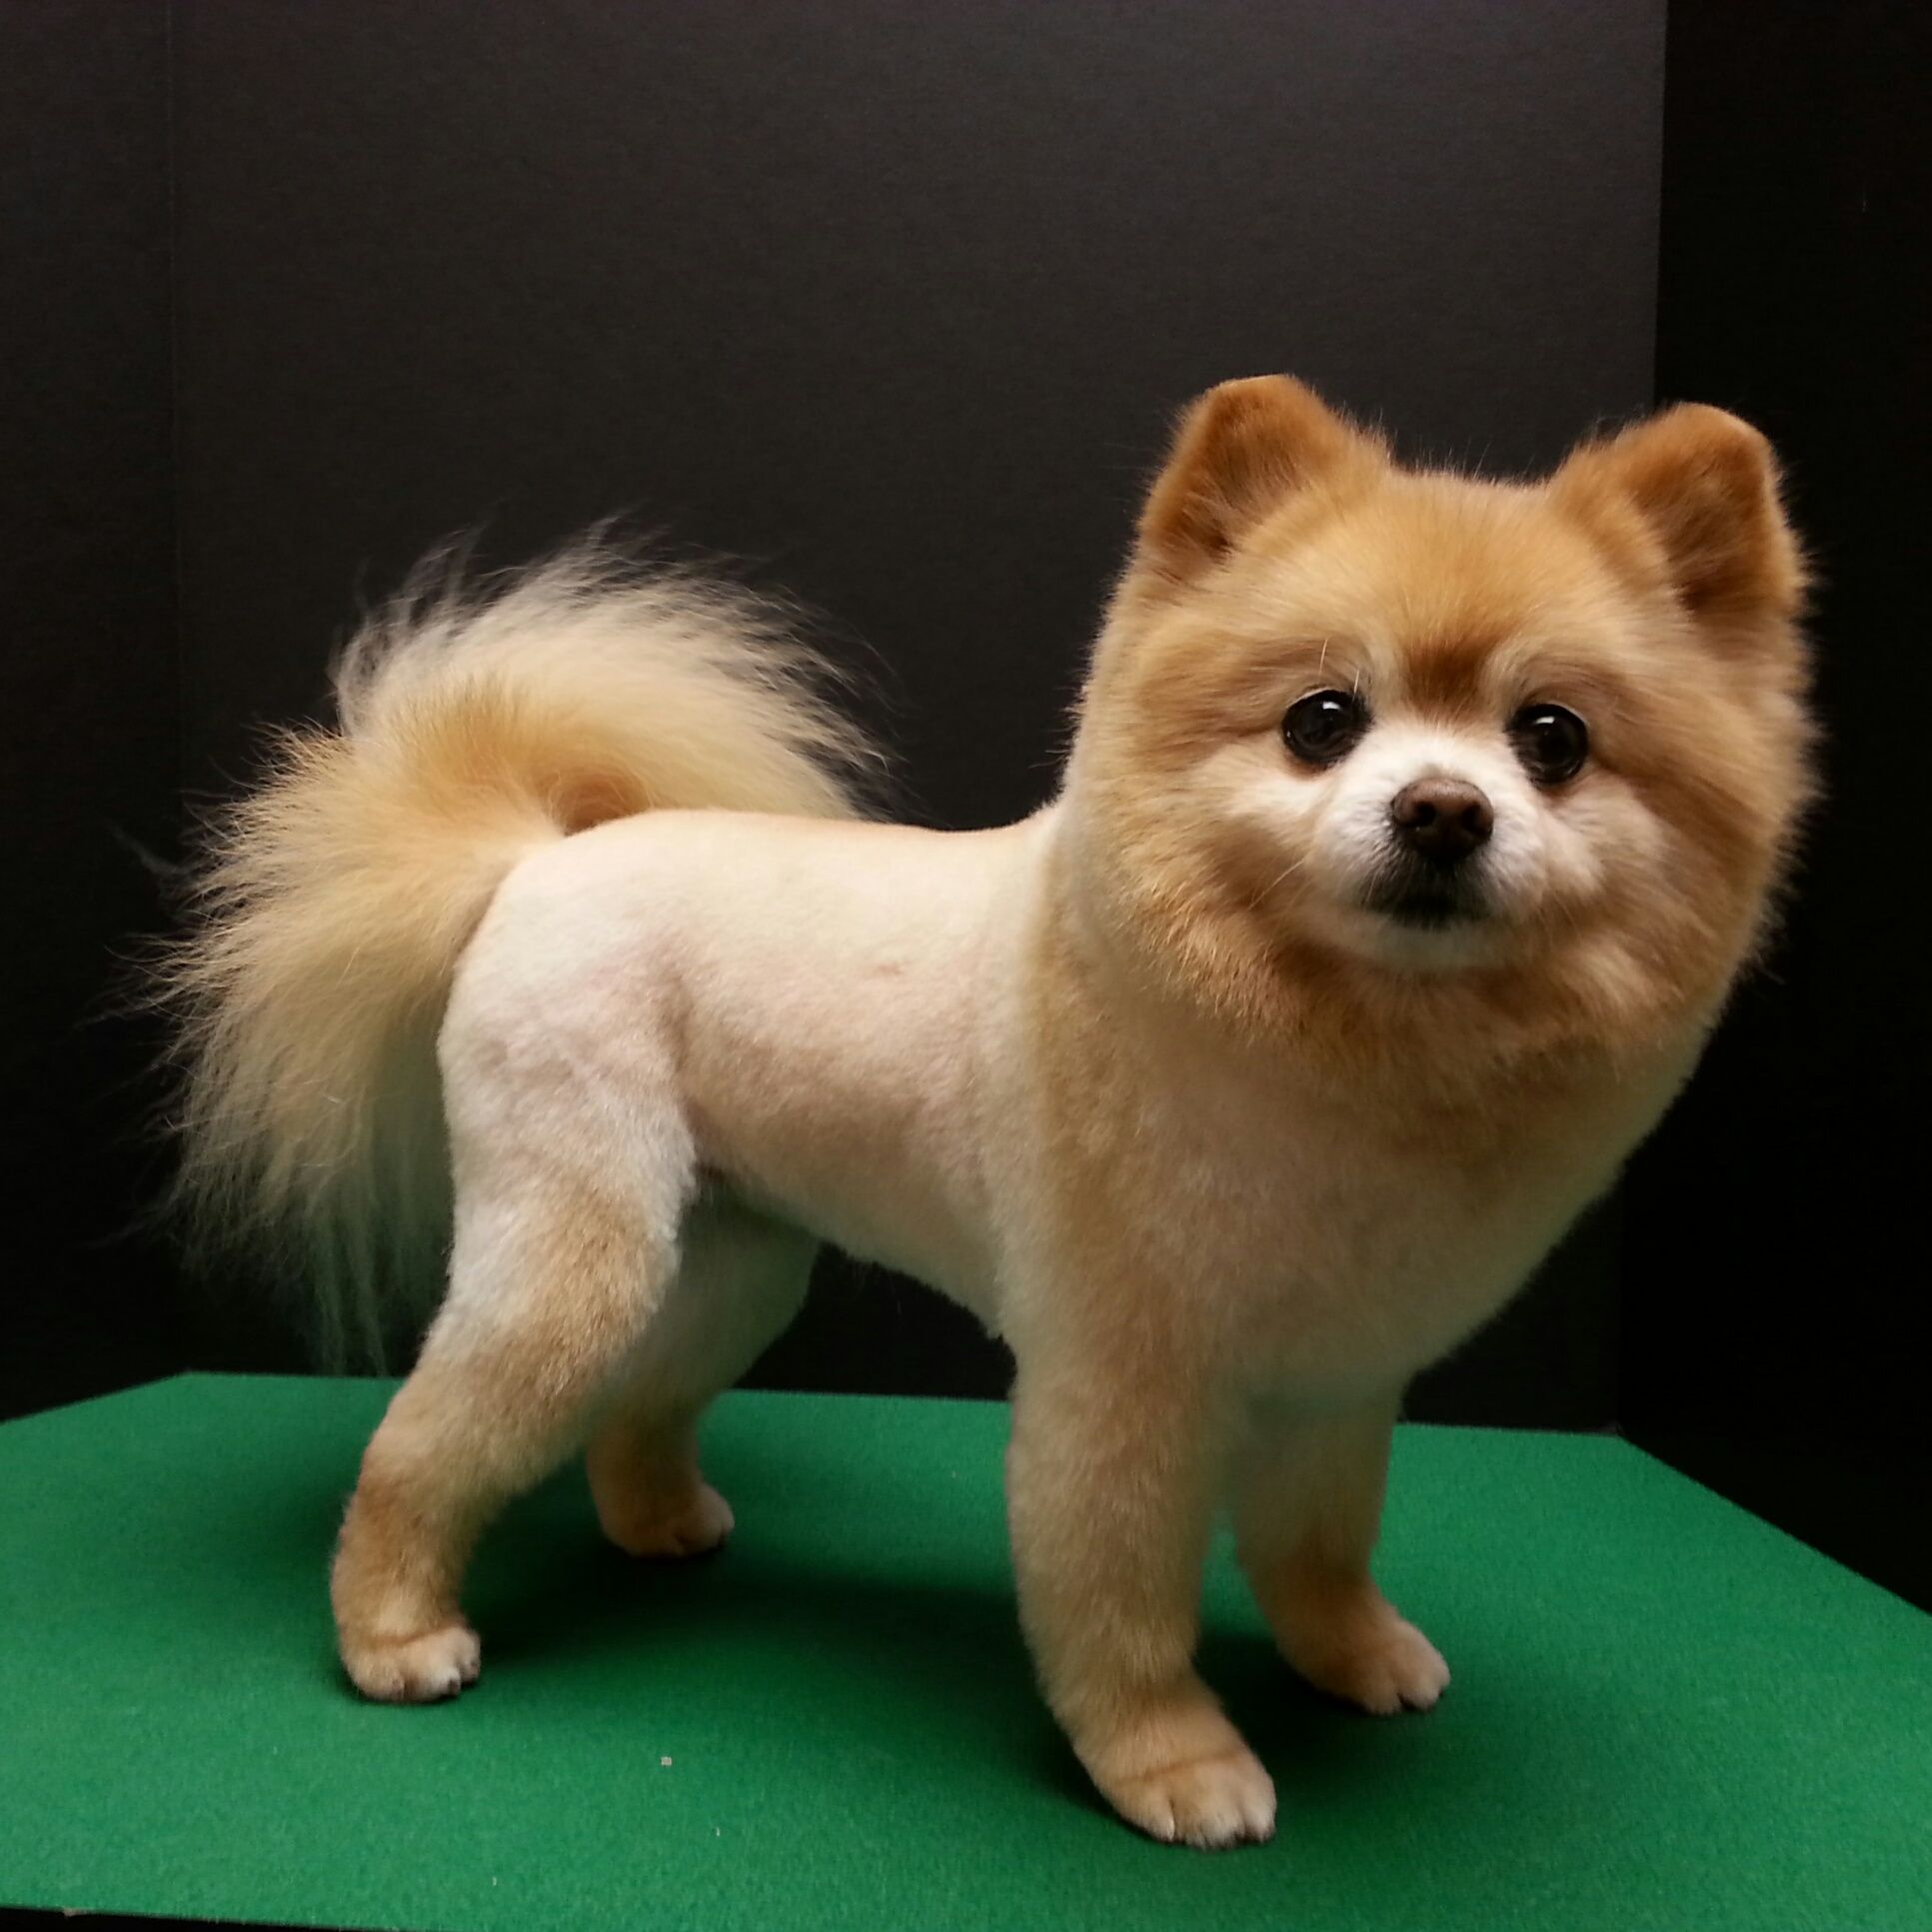 Pin By The Secret Life Of Pets On Gidget Pomeranian Puppy Dogs Pomeranian Haircut